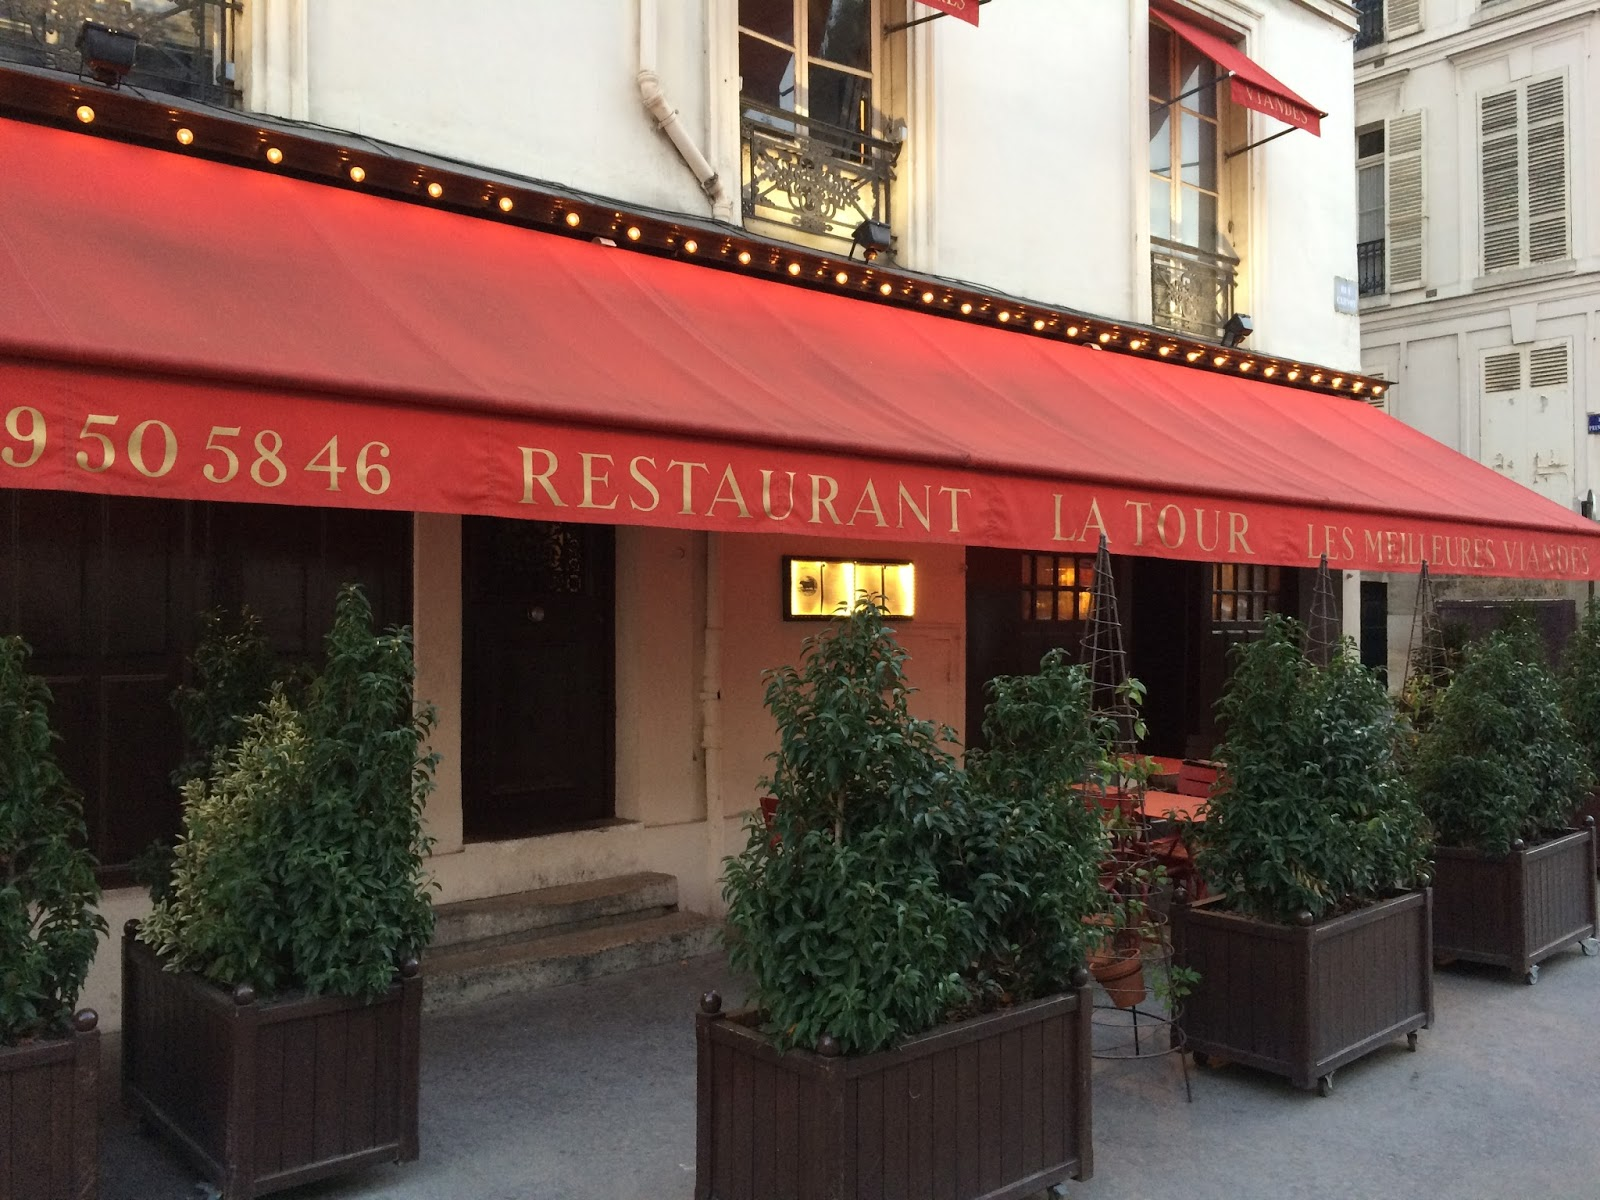 restaurant la tour versailles france travel is my. Black Bedroom Furniture Sets. Home Design Ideas